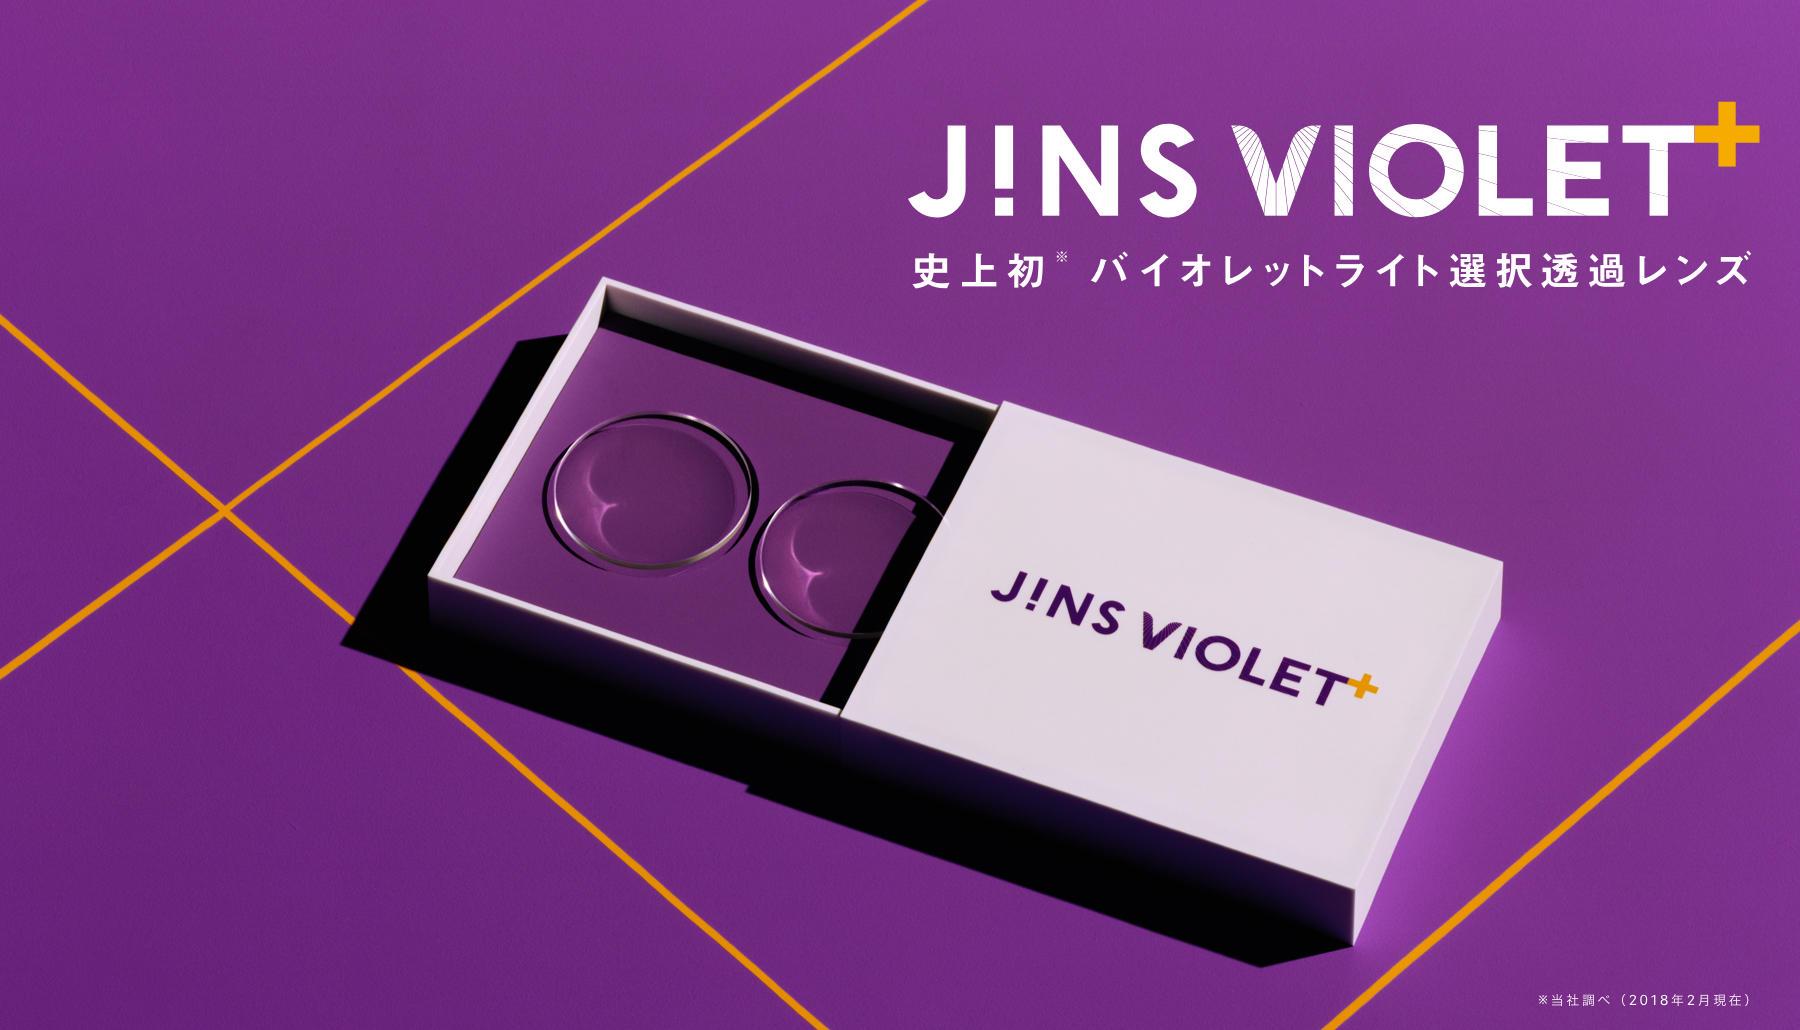 JINS VIOLET+でバイオレットライトを!